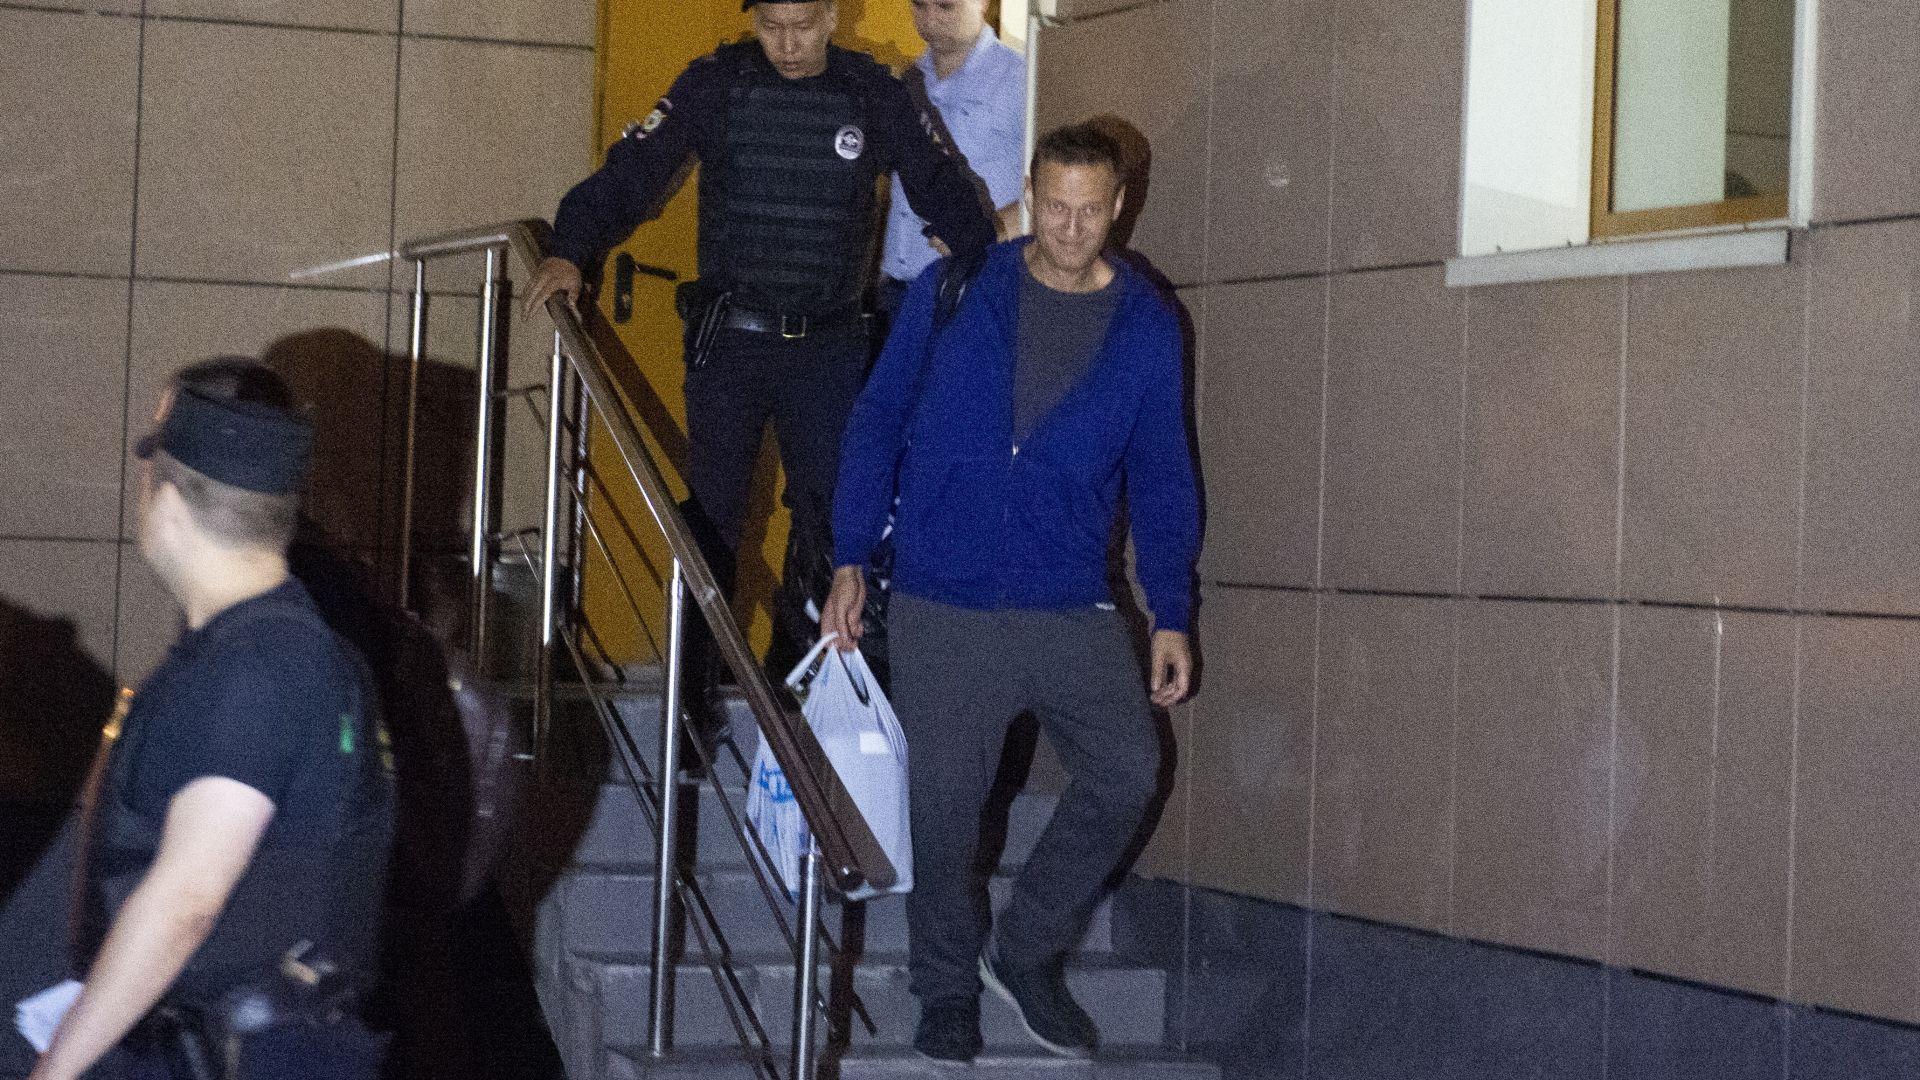 Навални осъден на 30 дни арест заради призив за митинг